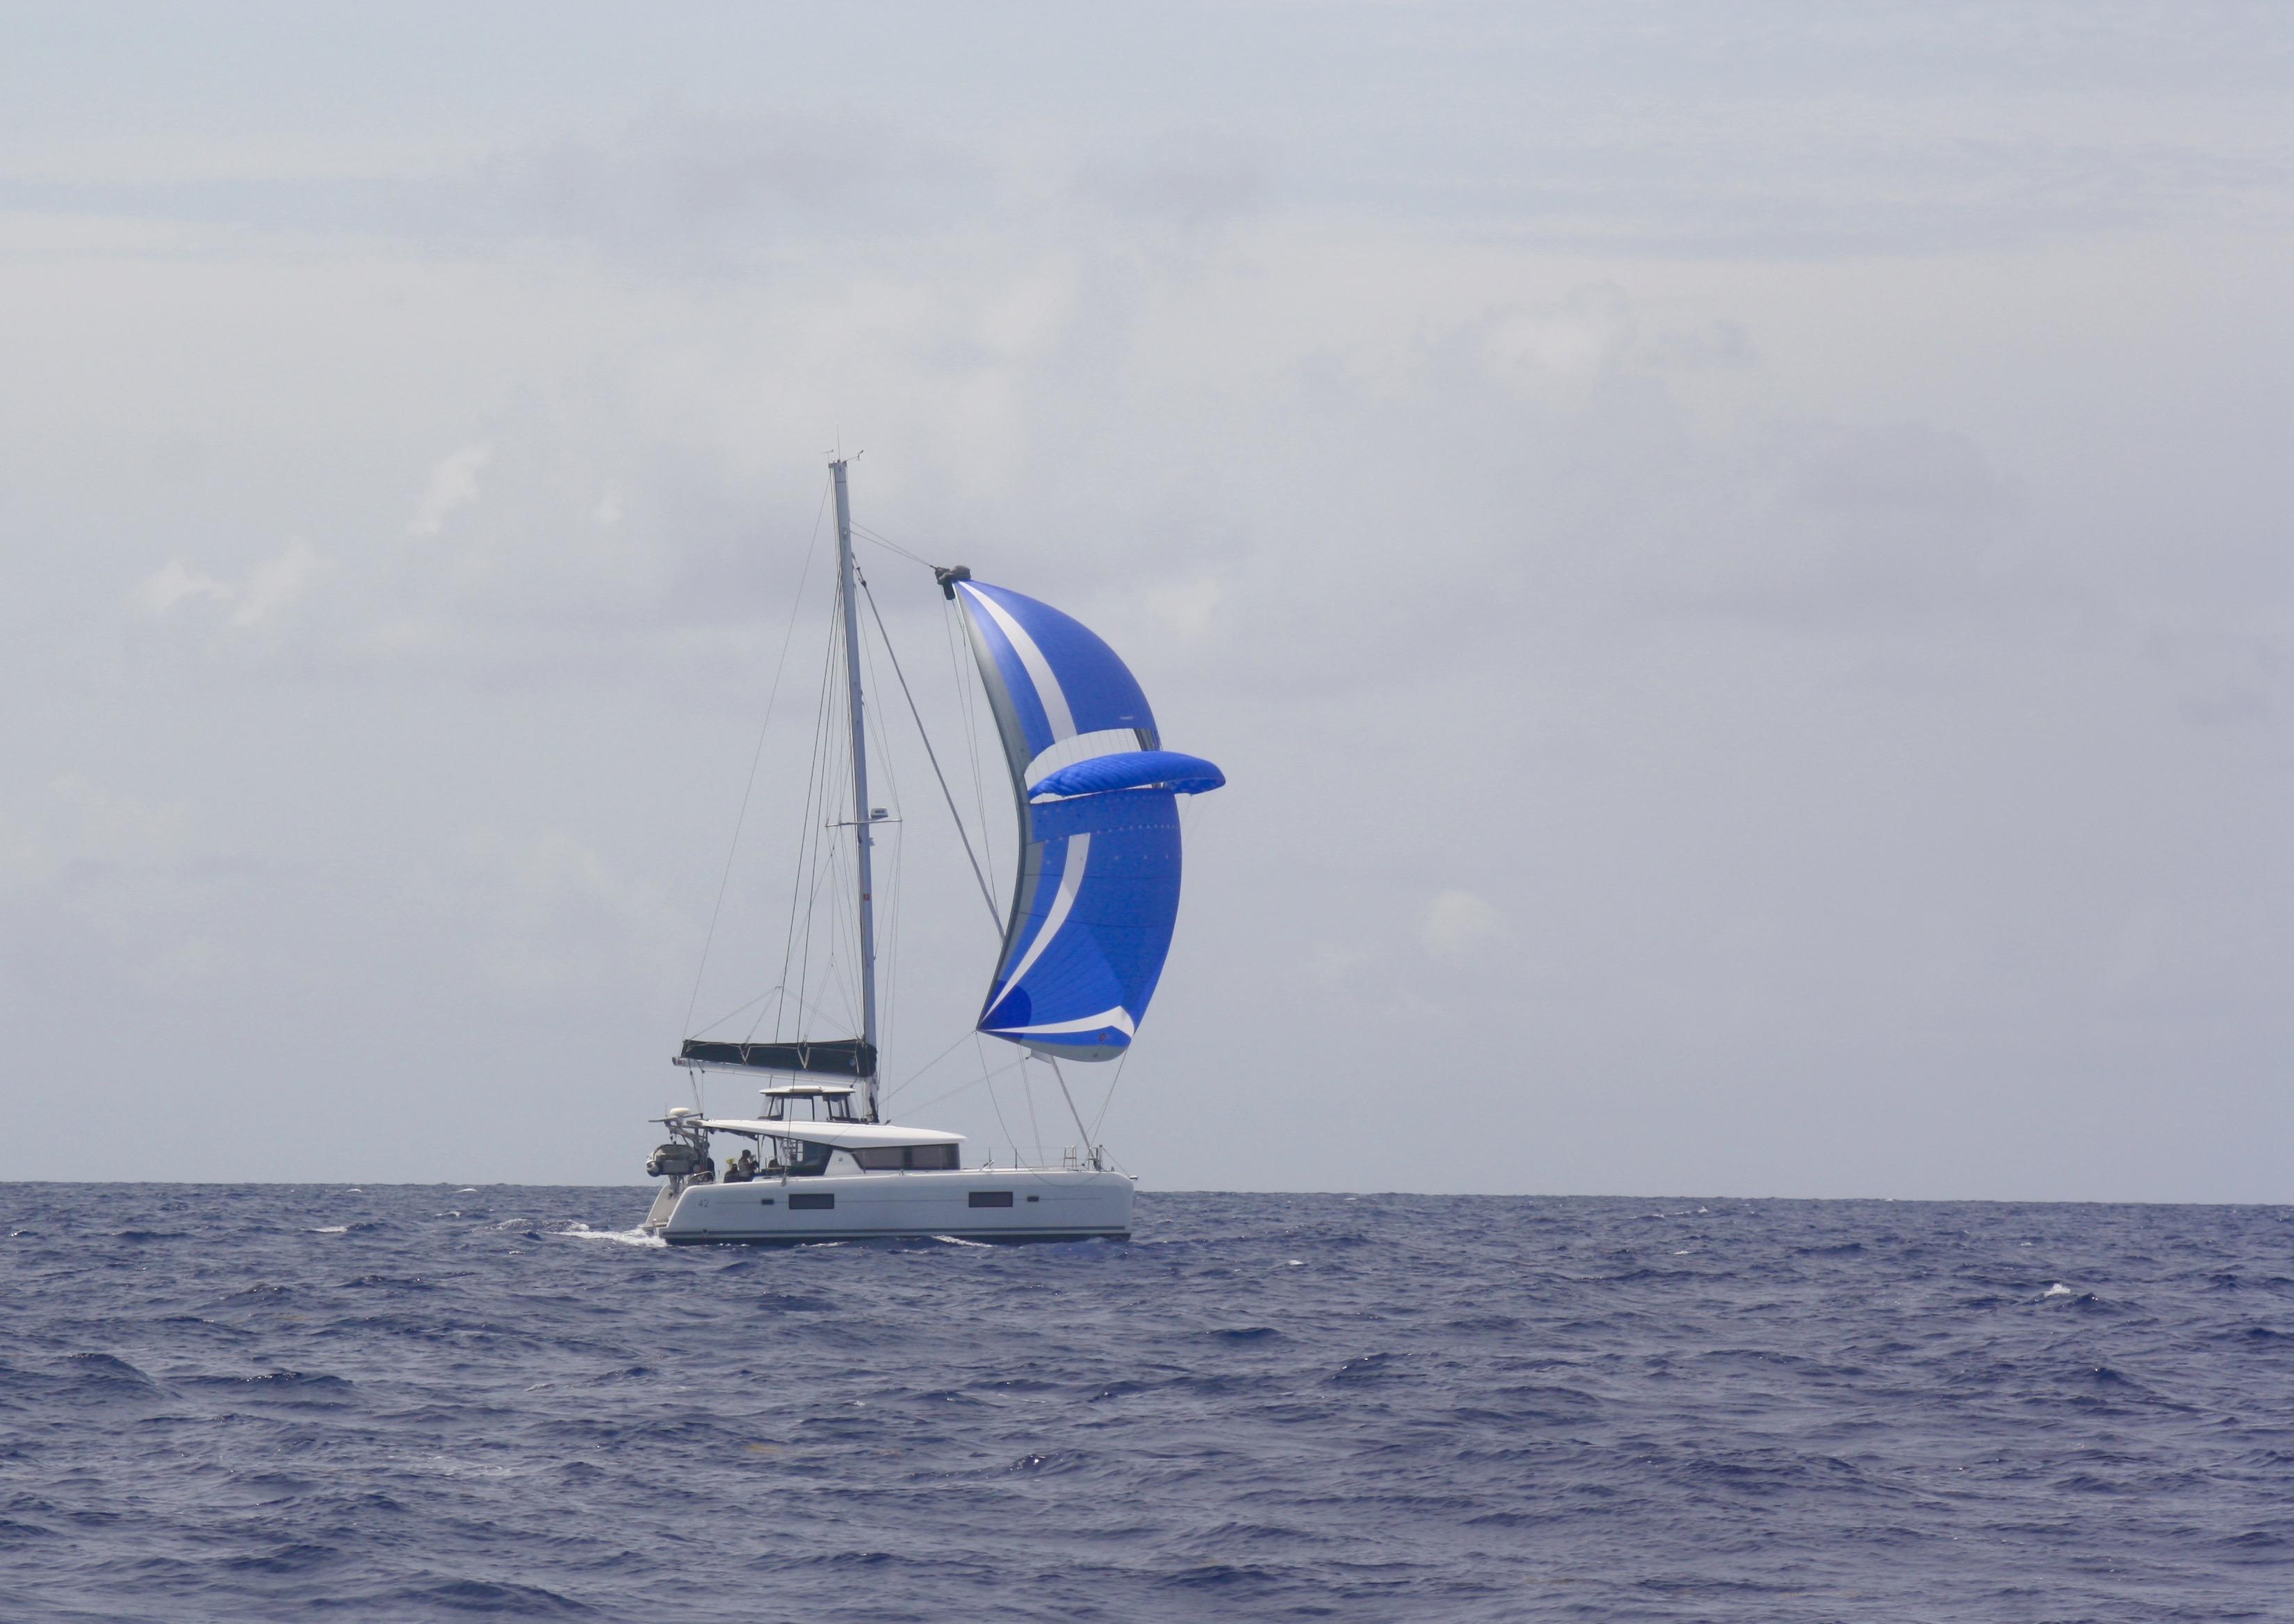 «Vega» under sail in San Blas, Panama with a parasail. // «Vega» under en behagelig seilas med paraseil ved San Blas i Panama.